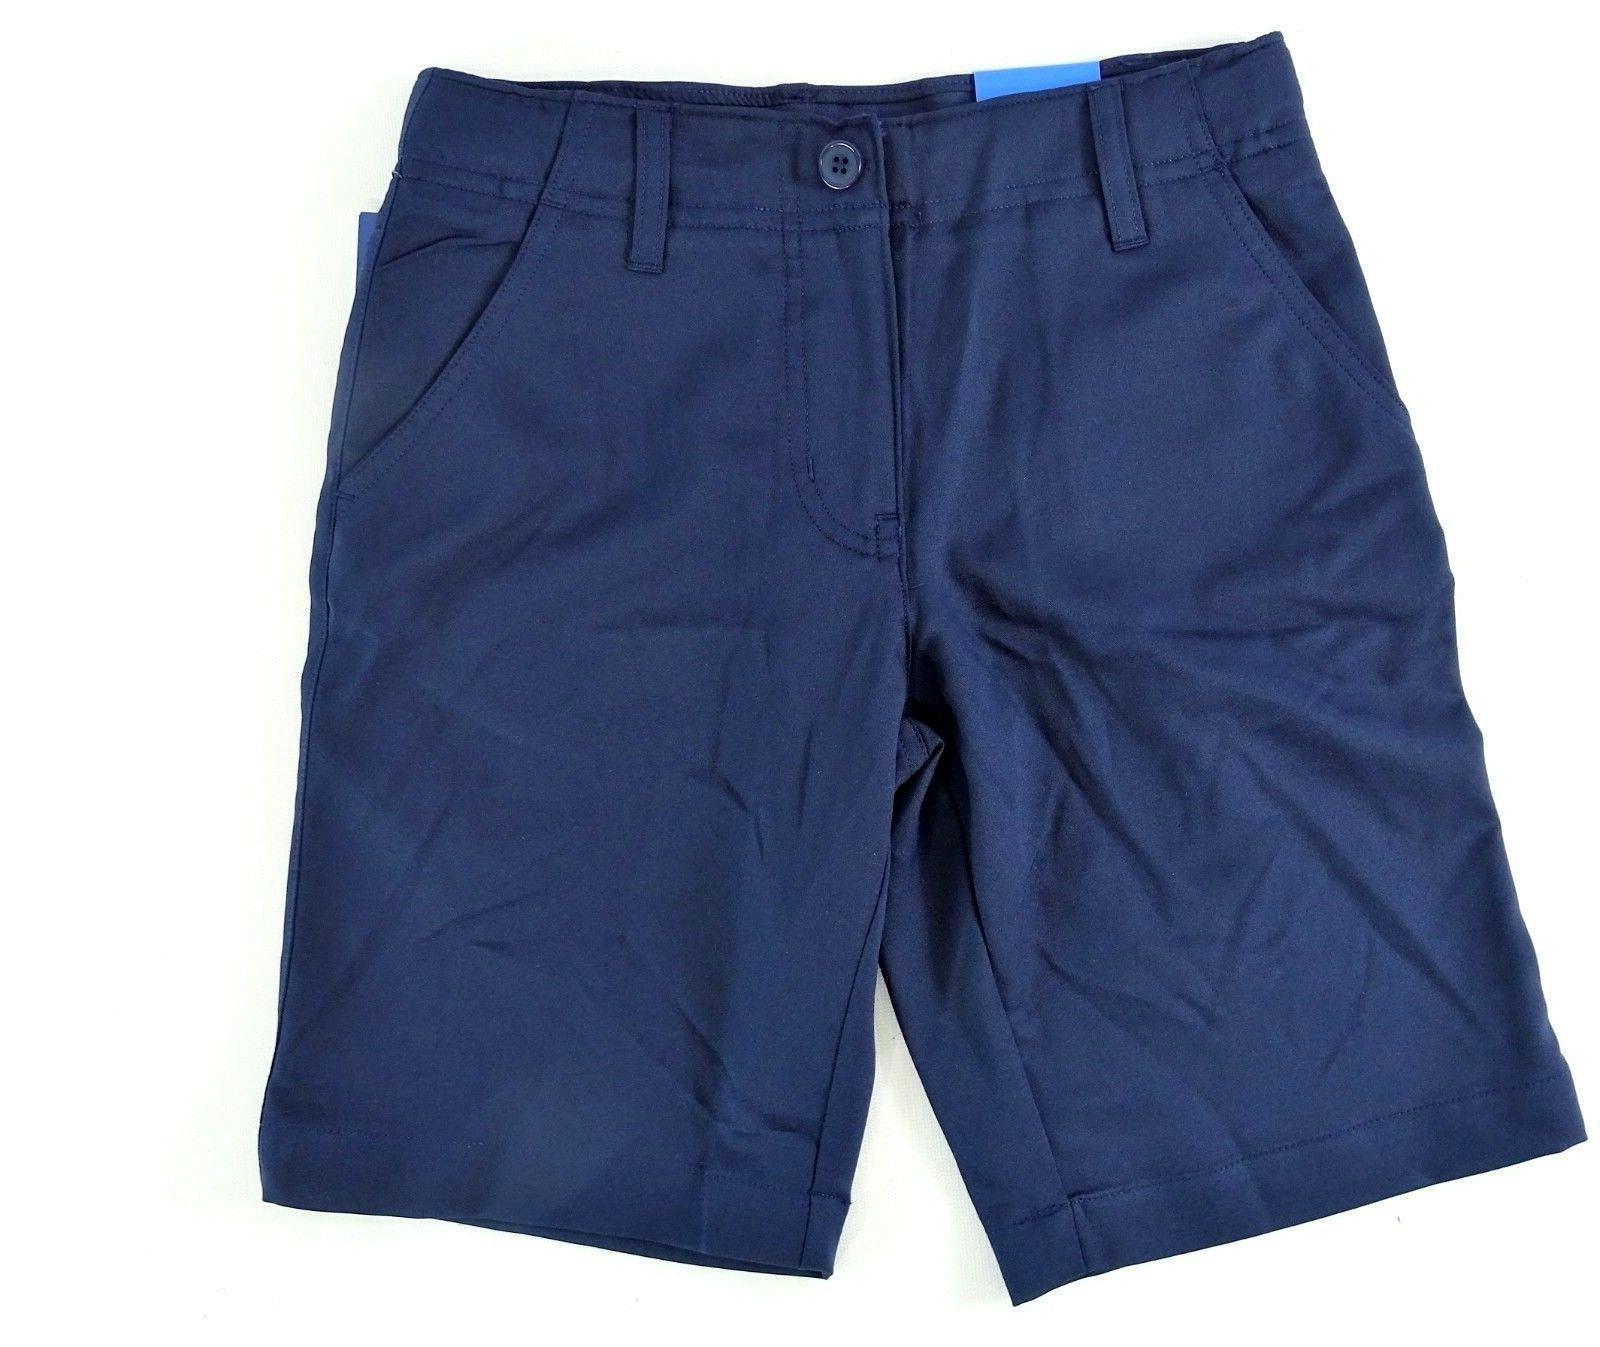 New! French Boys Uniform Pants Variety